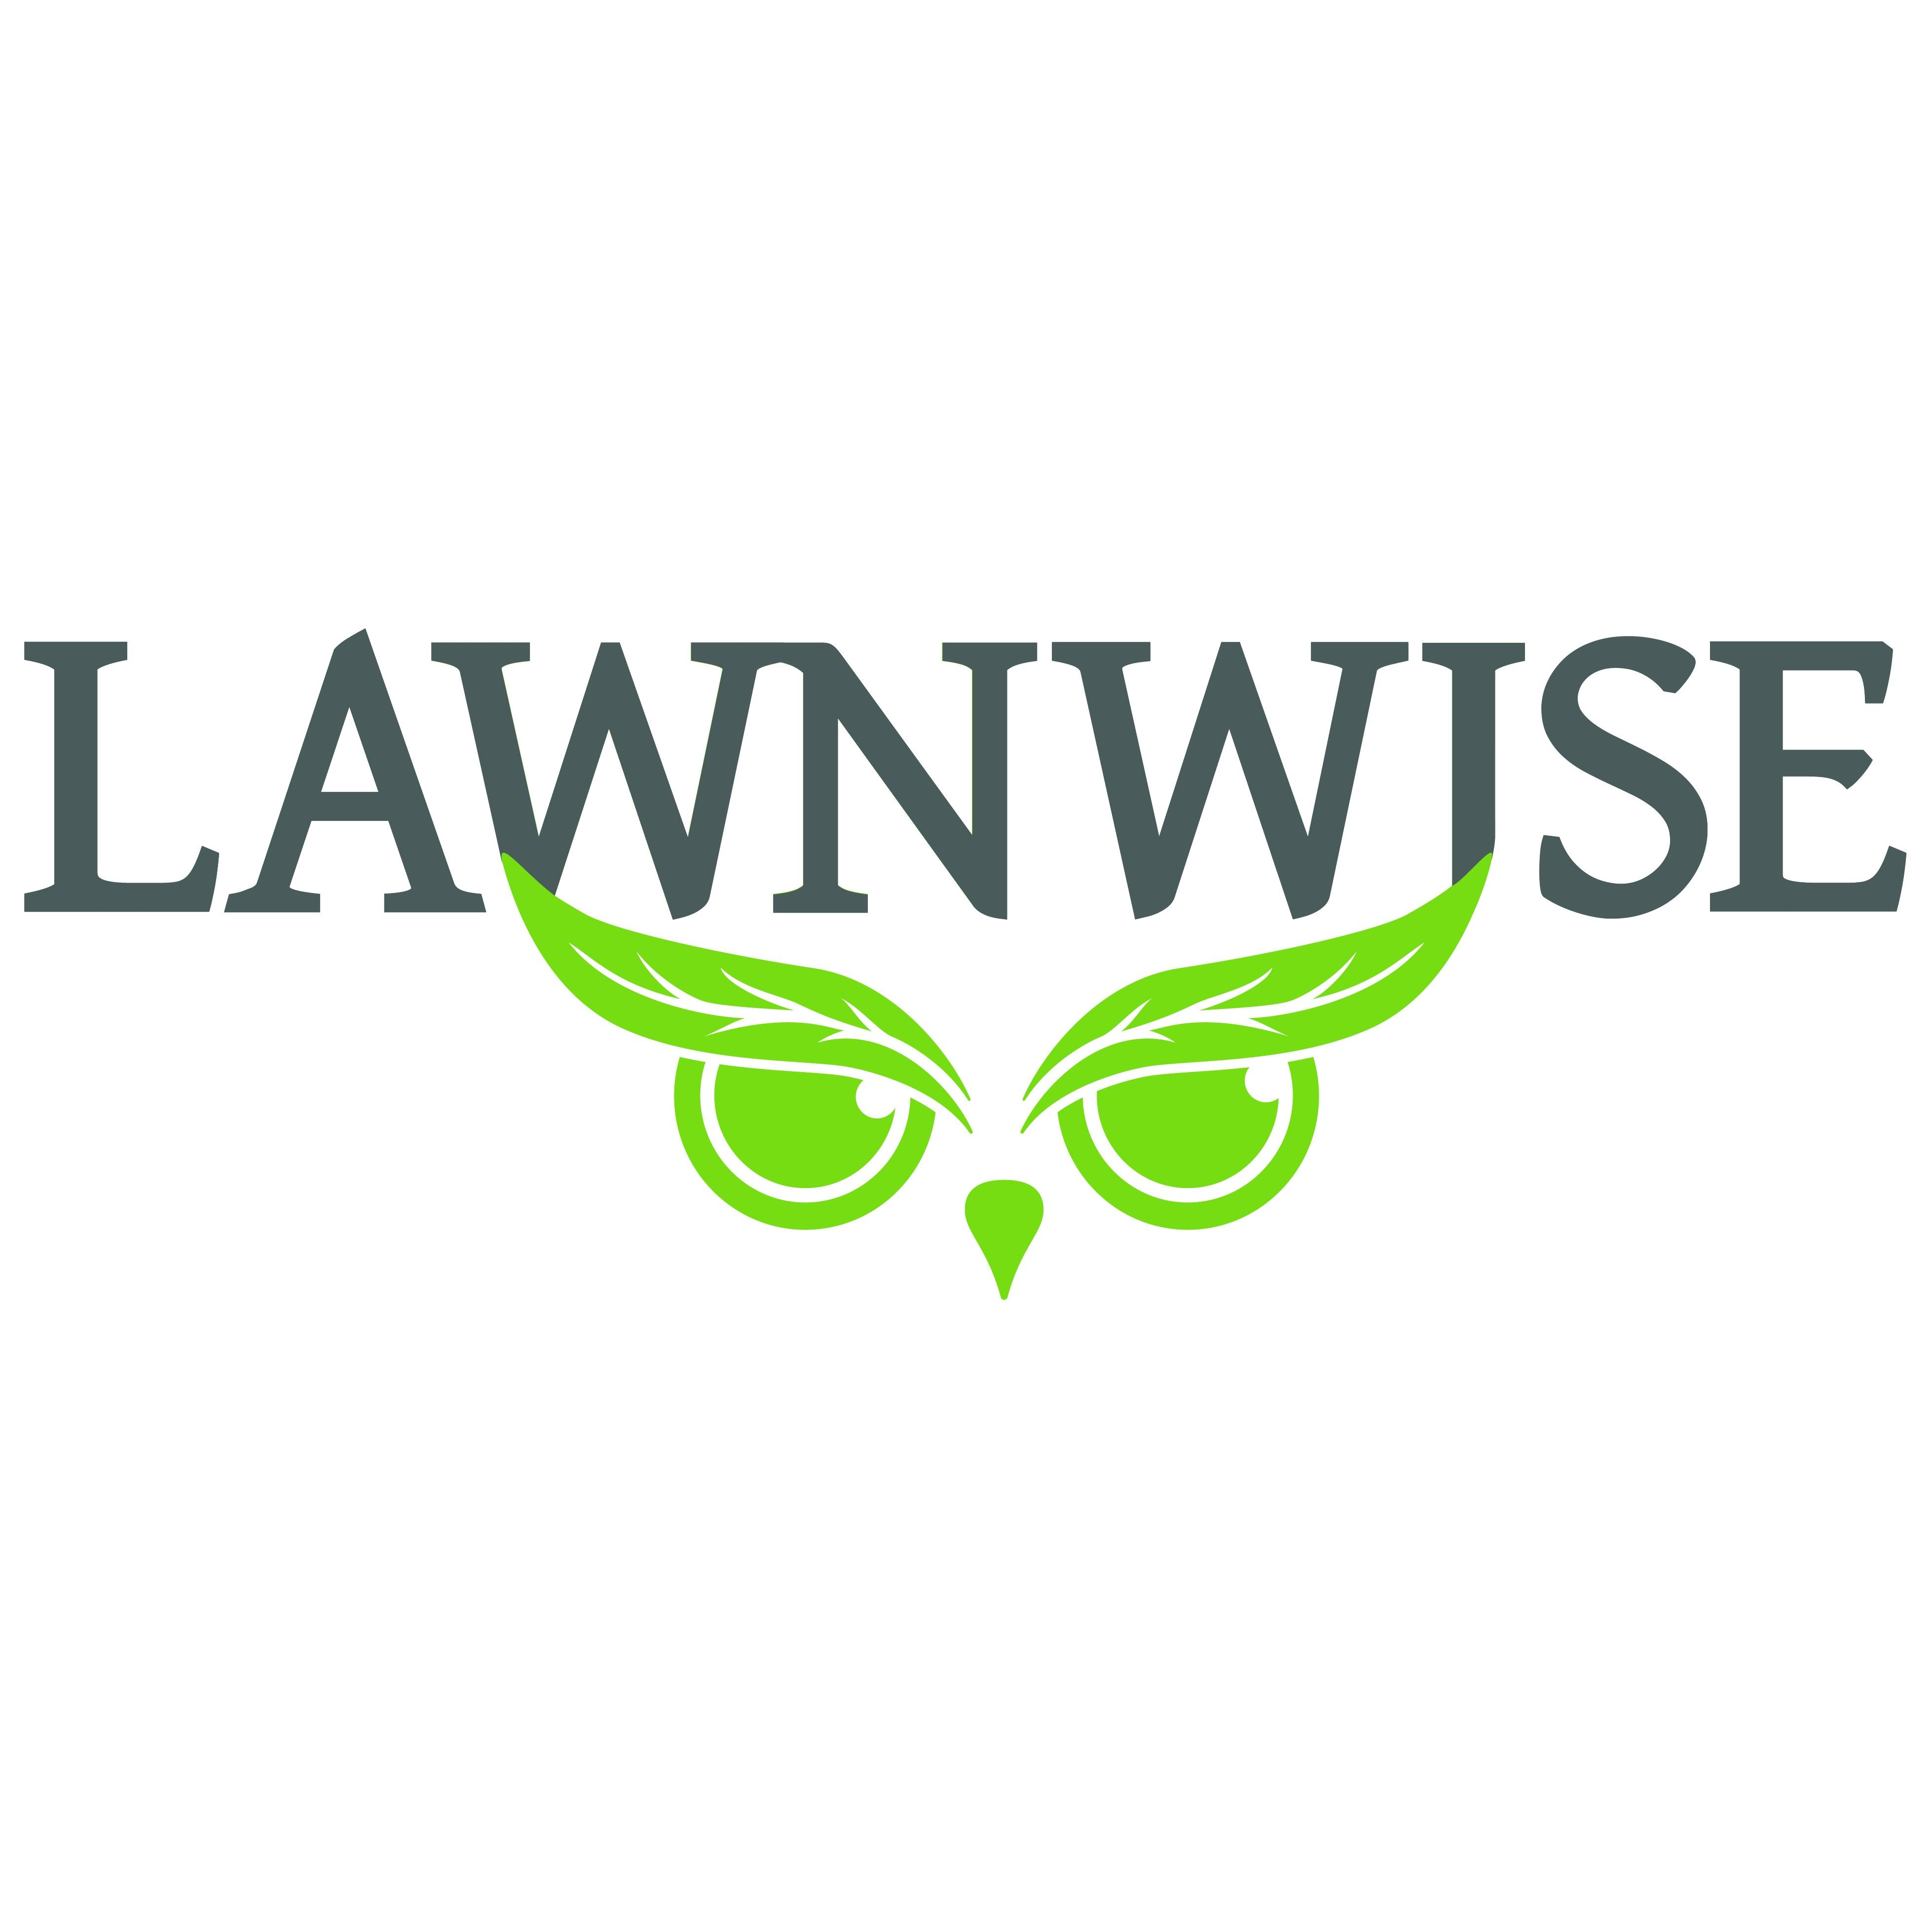 LawnWise